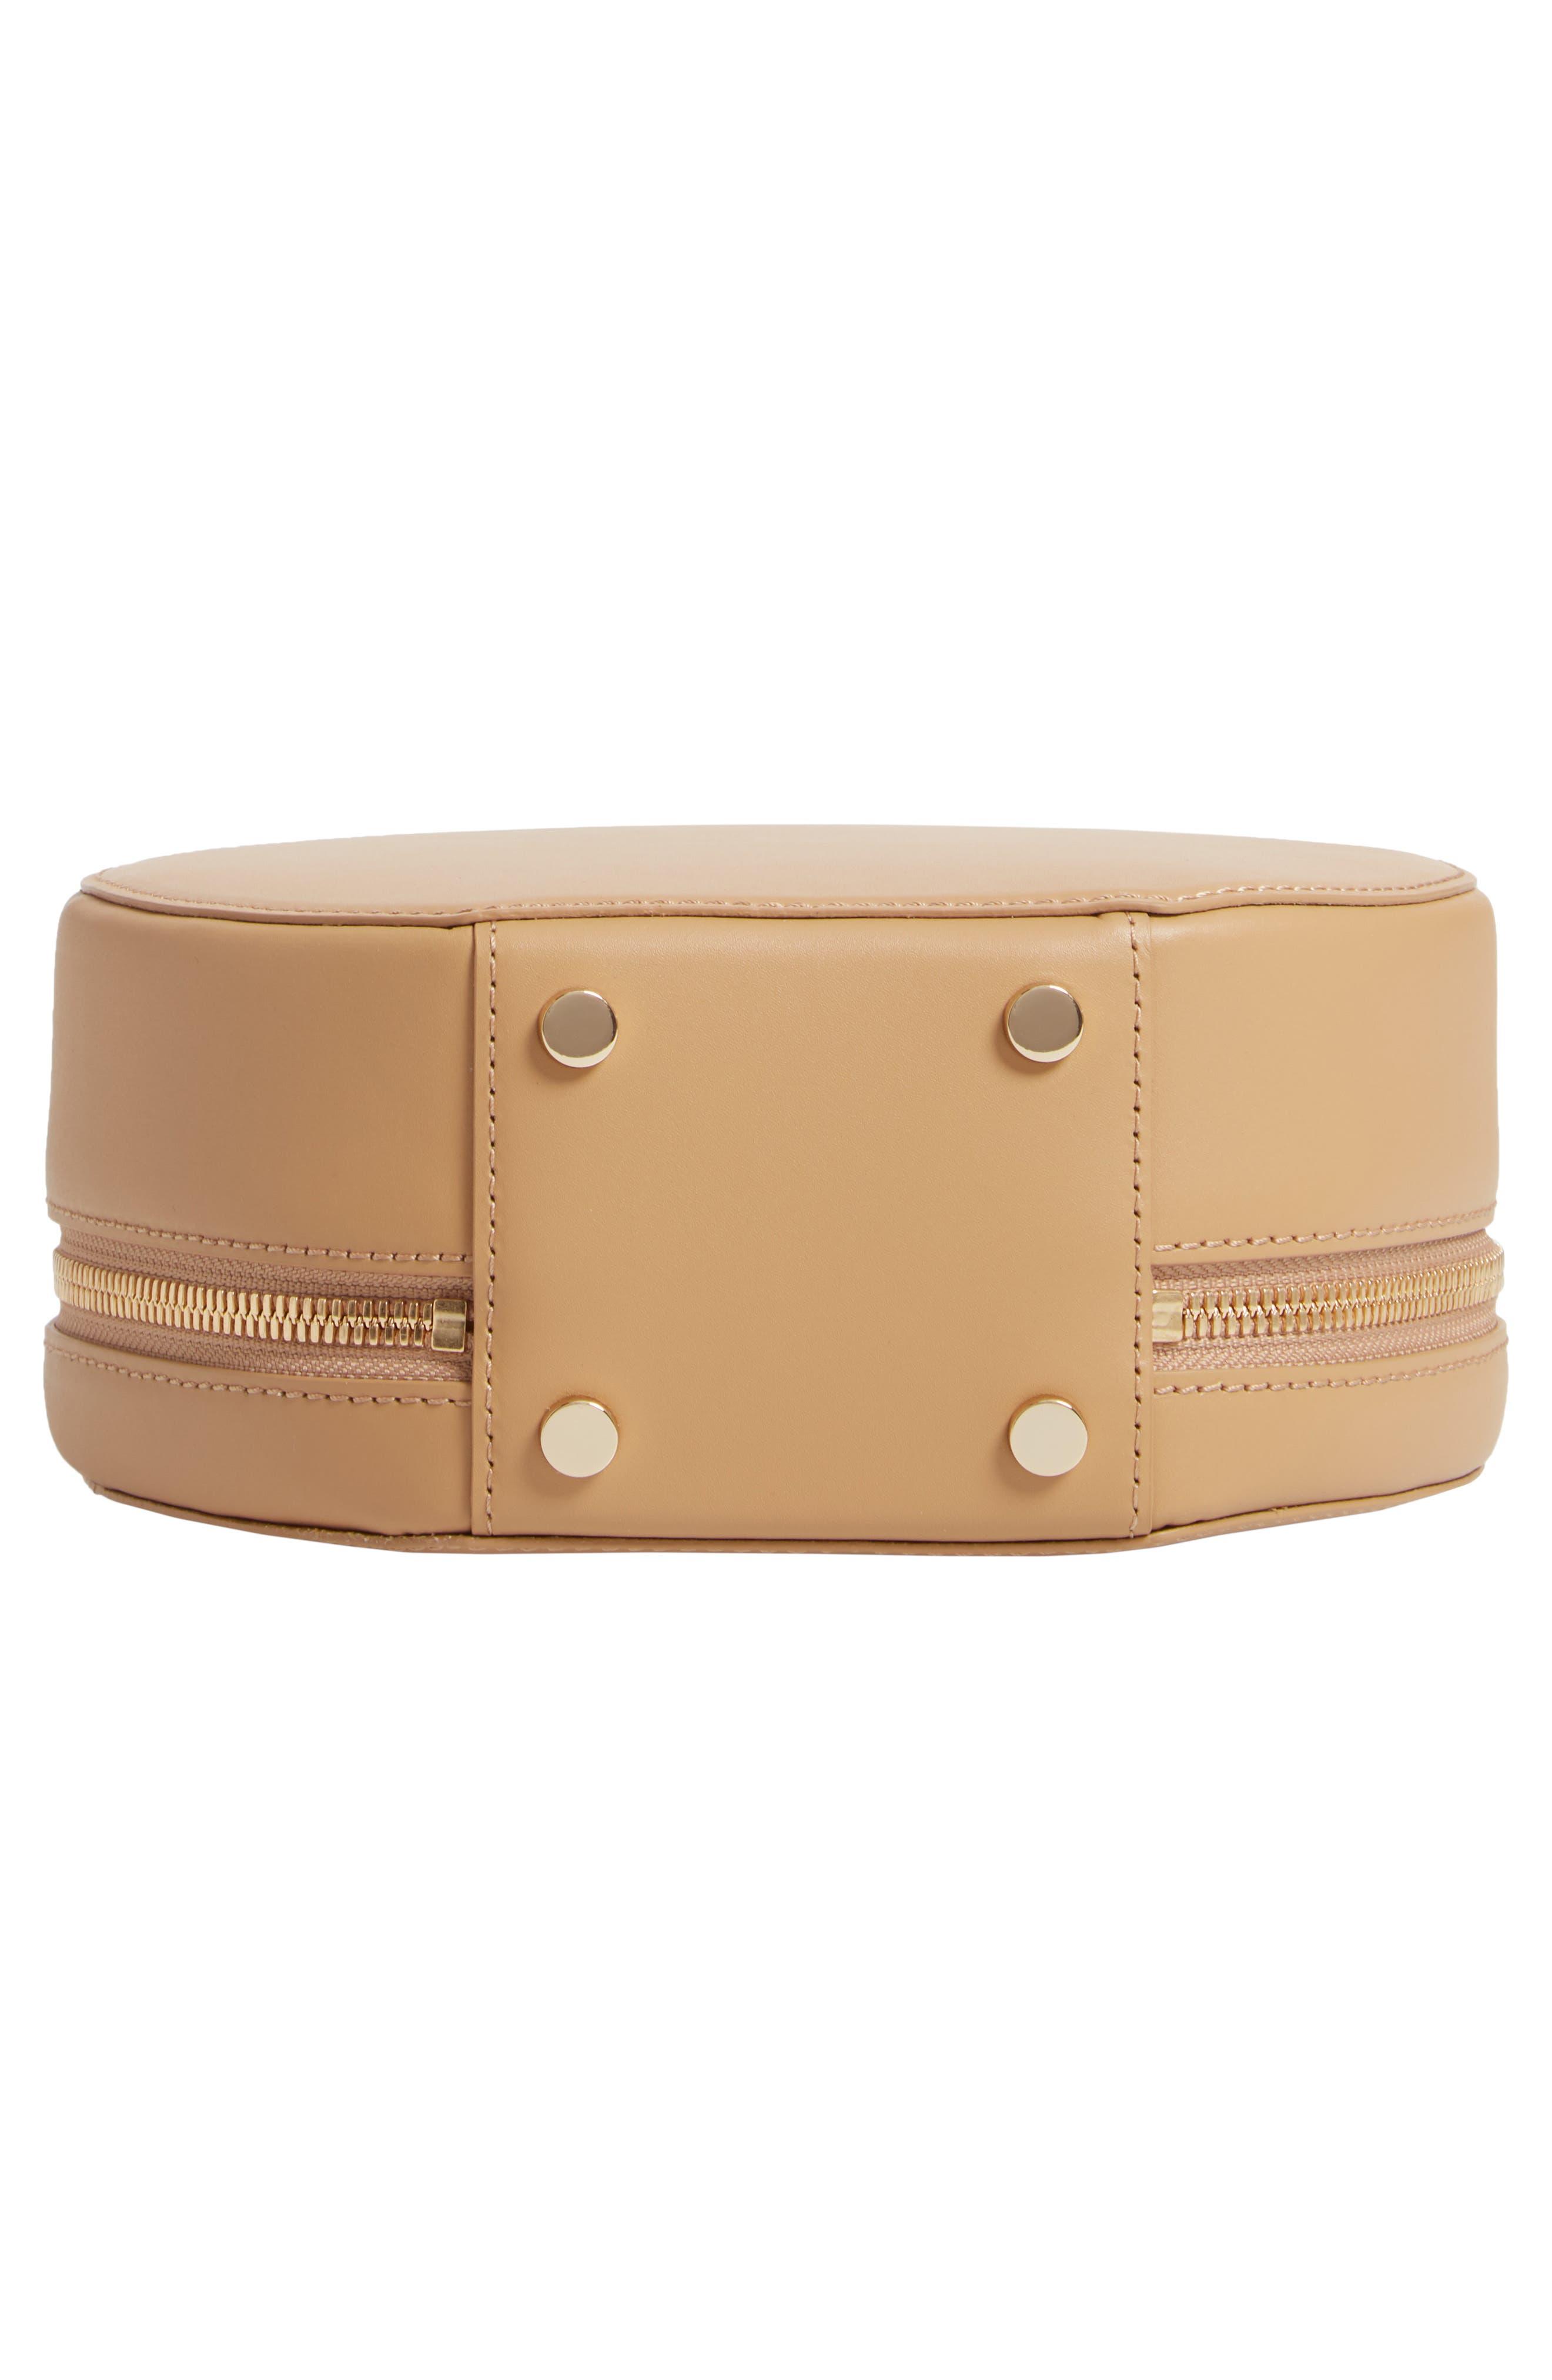 OAD NEW YORK,                             Mini Circle Pebbled Leather Satchel,                             Alternate thumbnail 6, color,                             LIGHT CAMEL